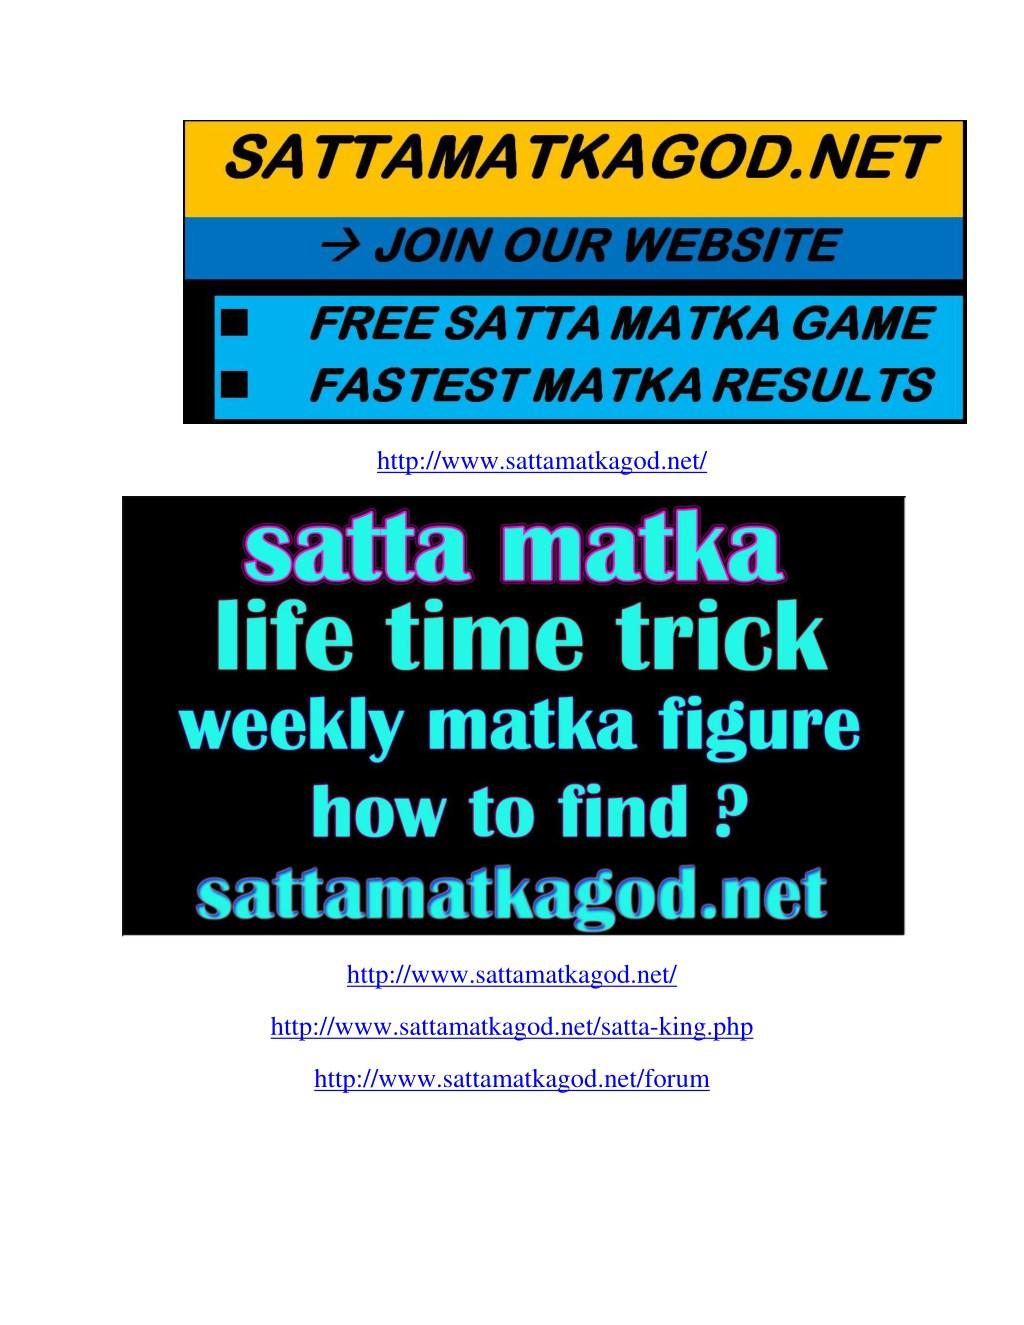 PPT - SATTA MATKA | FREE SATTA GAME | SATTA MATKA LIFE TIME